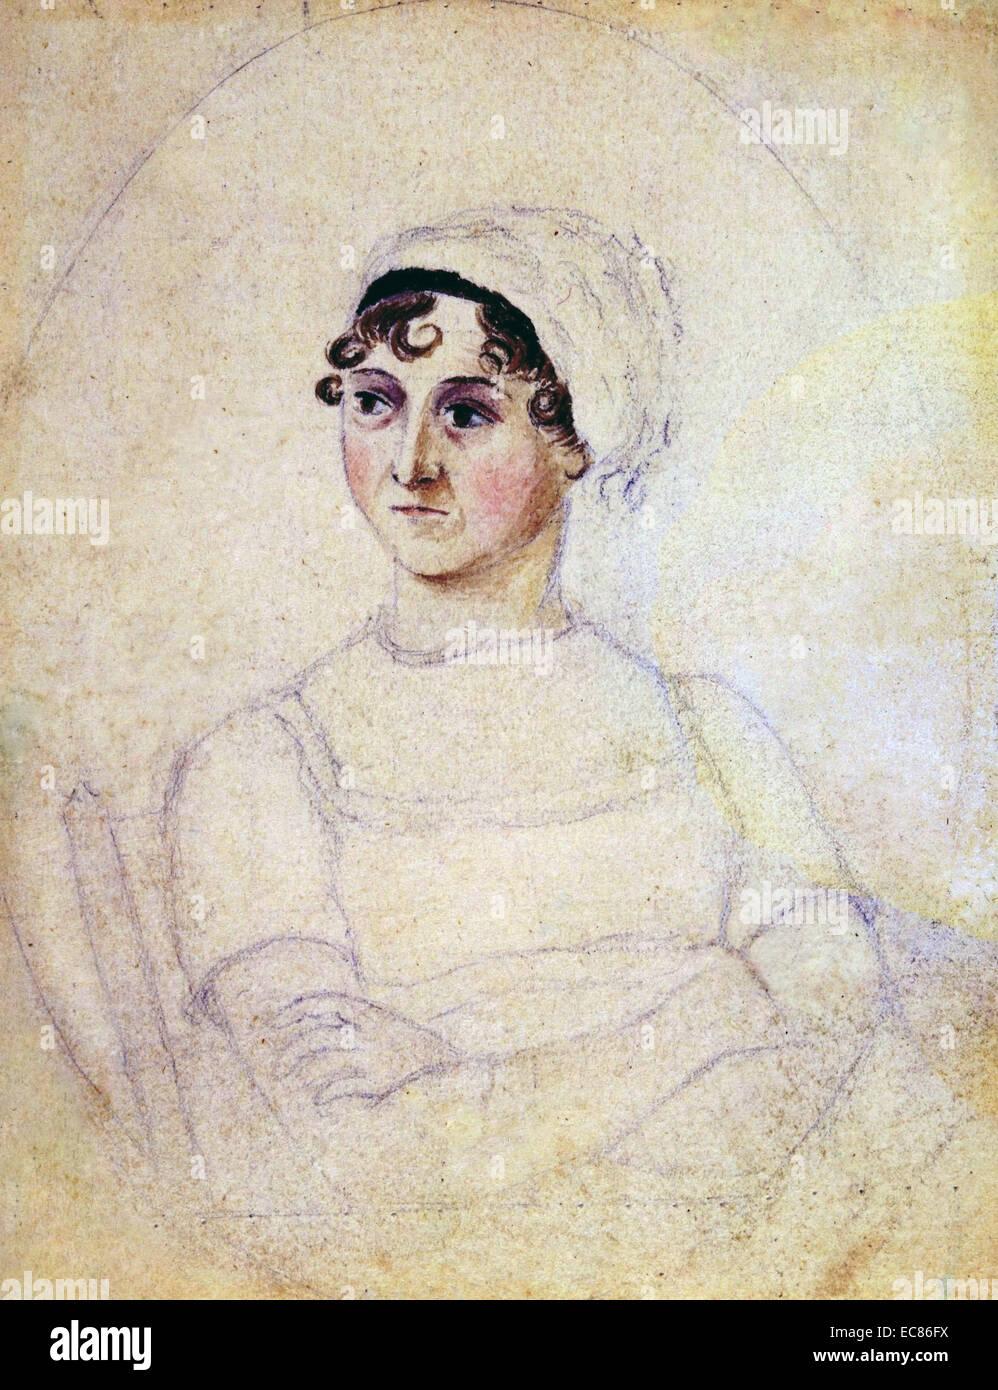 Color retrato de Jane Austen (1775-1817) dibujado por su hermana Cassandra. Fecha 1810 Imagen De Stock